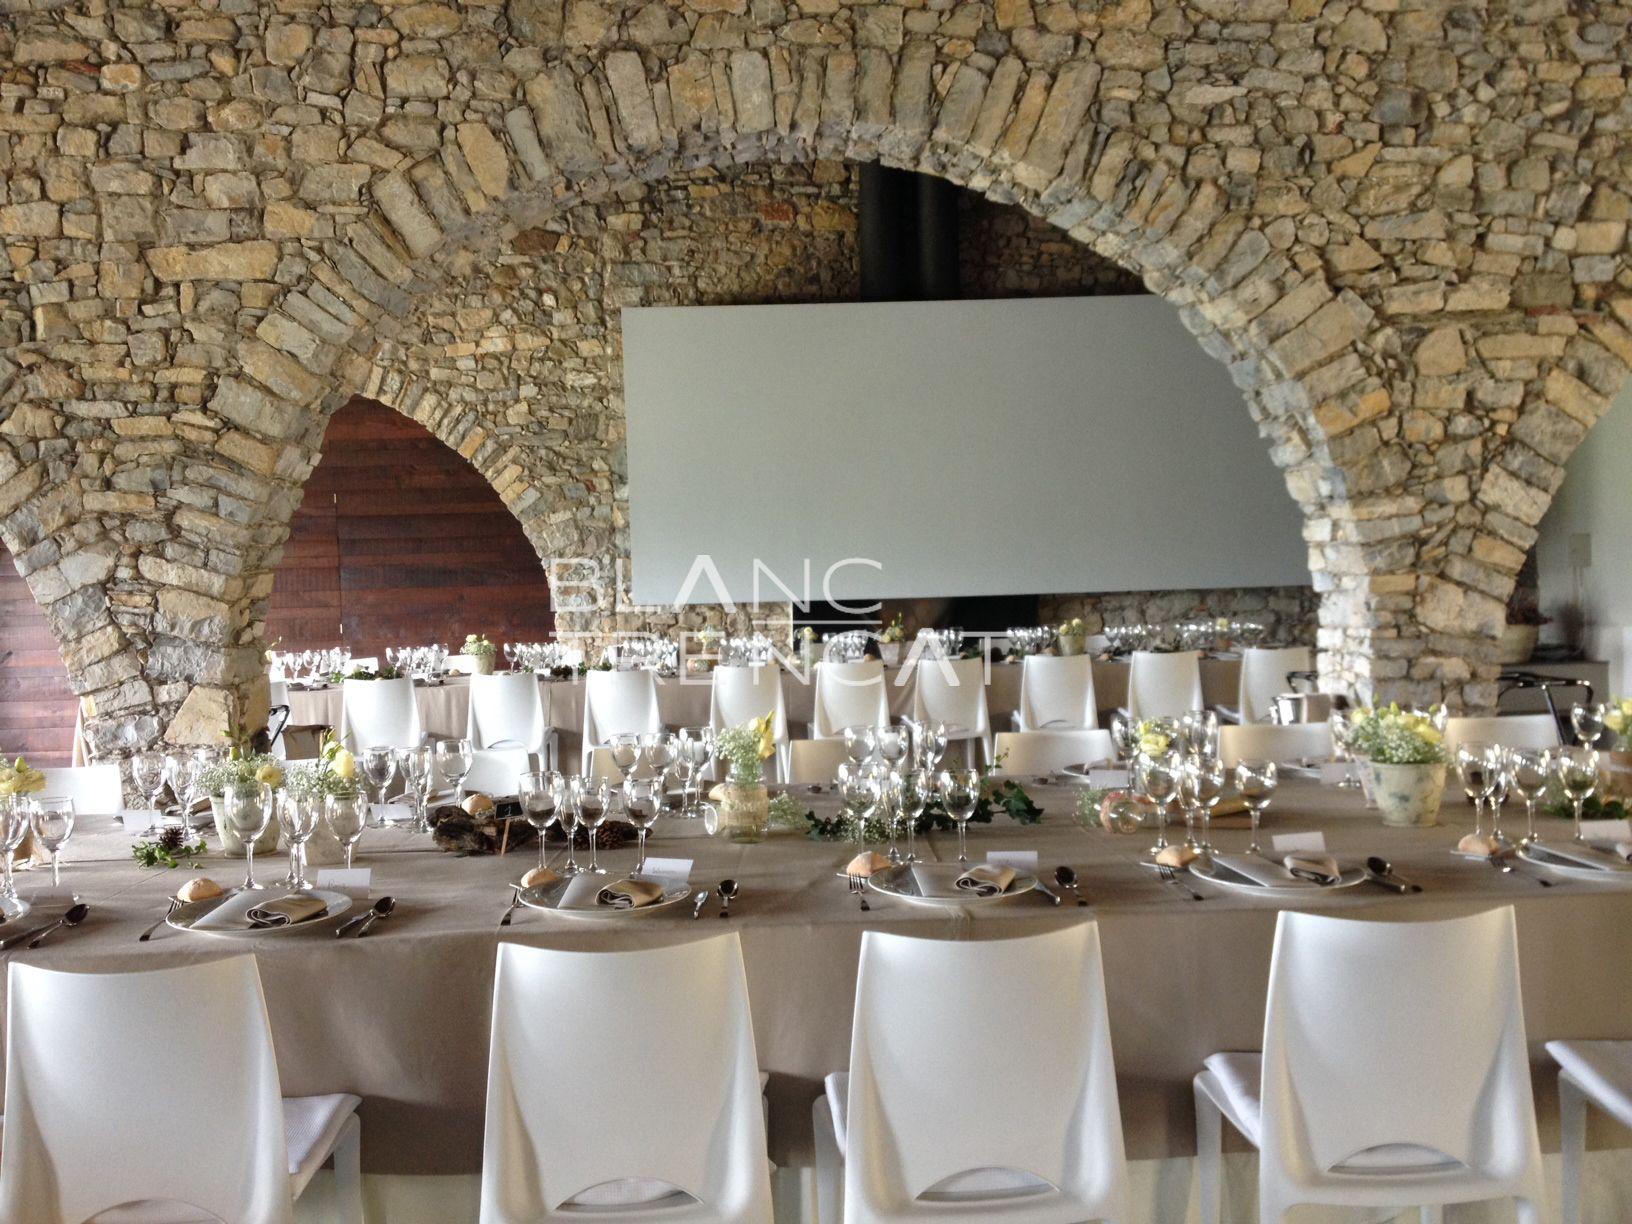 Decoraci n centros de mesa para bodas verde arcos de piedra sala celebraci n wedding - Mesas de piedra ...